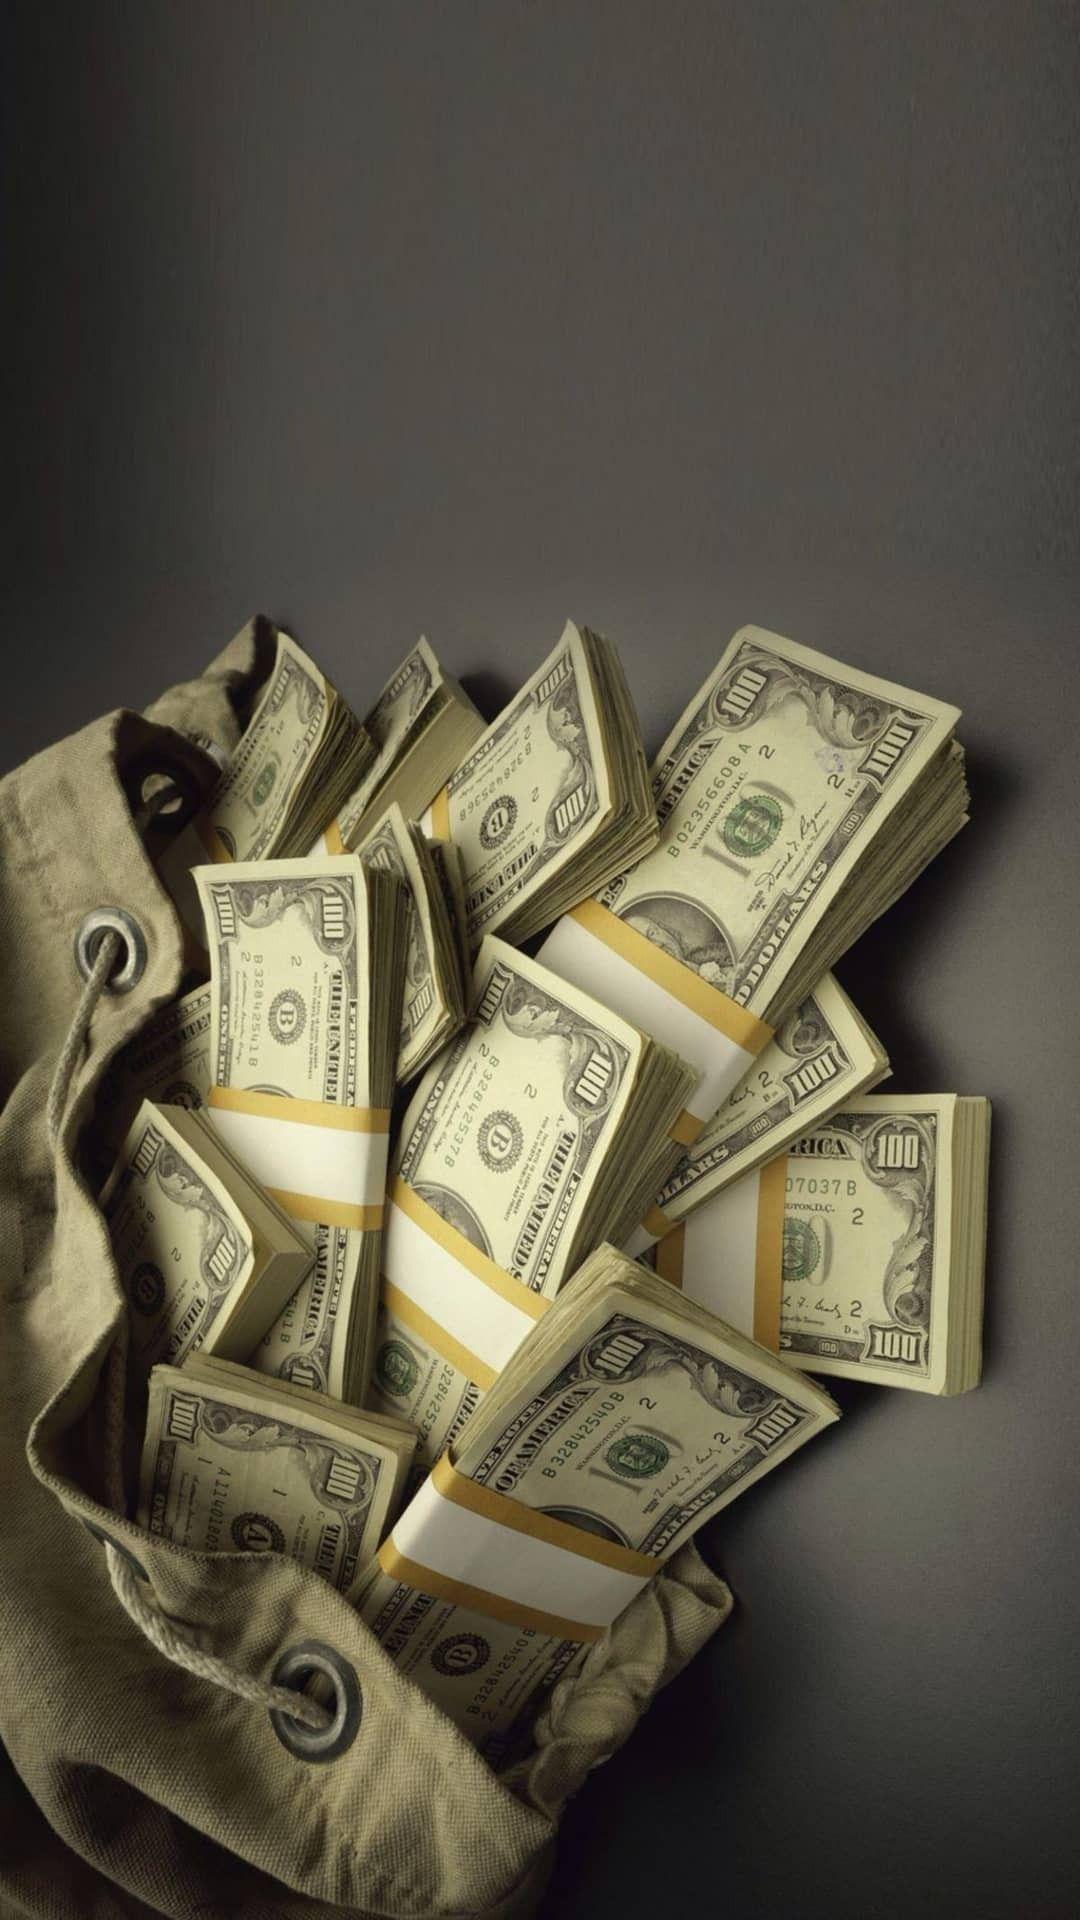 Pin by ಶೇಖರ್ ಮಡಿವಾಳ on crazy boy Money wallpaper iphone